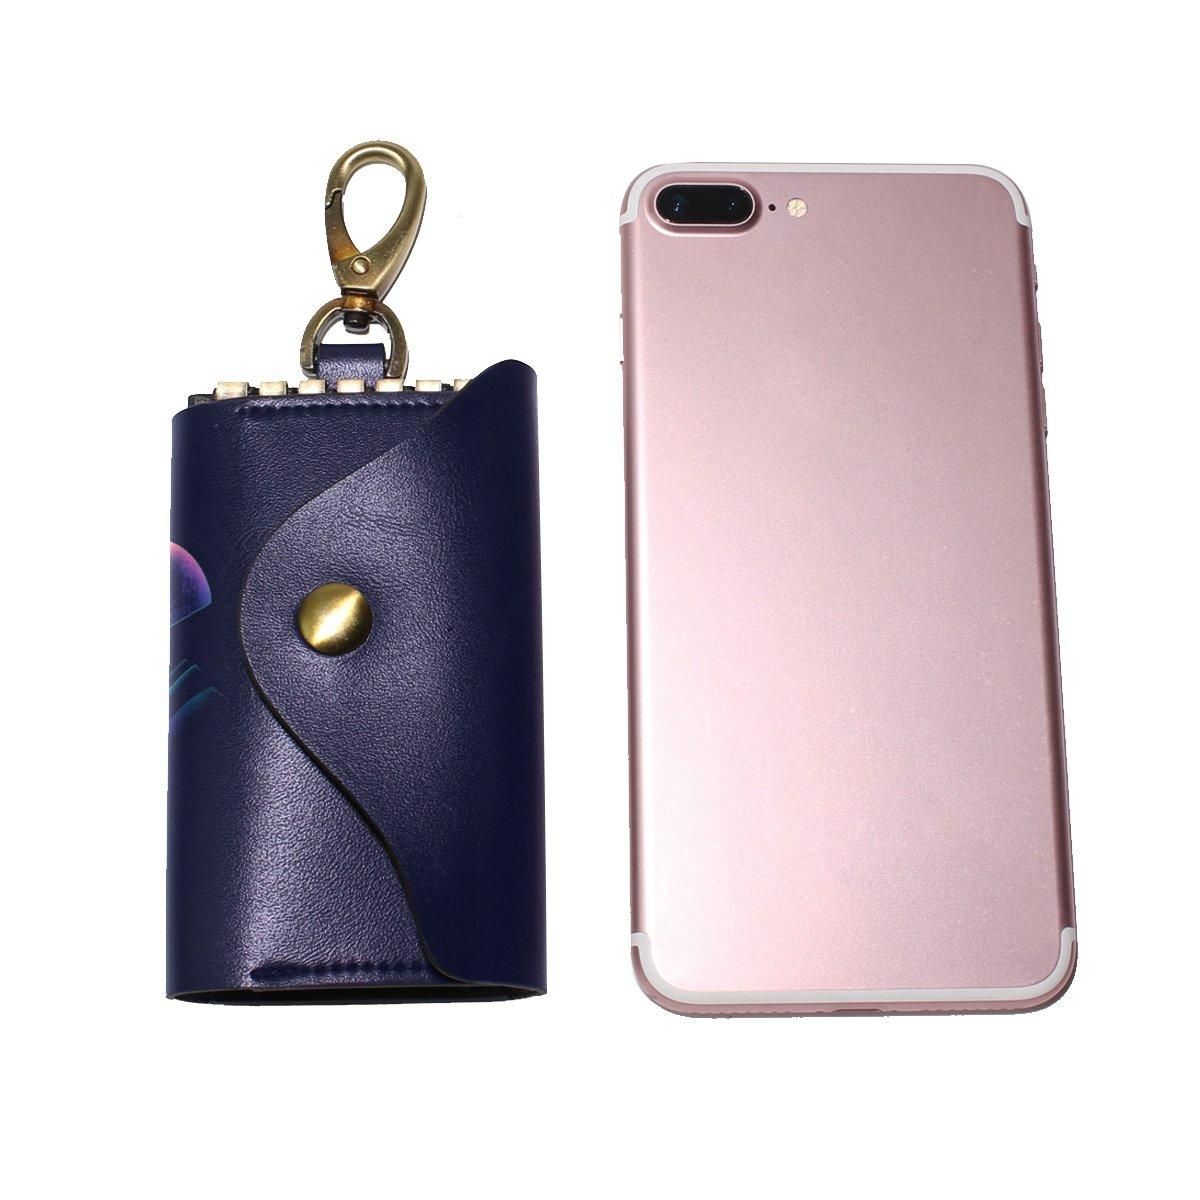 DEYYA Daft Punk Dj Art Leather Key Case Wallets Unisex Keychain Key Holder with 6 Hooks Snap Closure